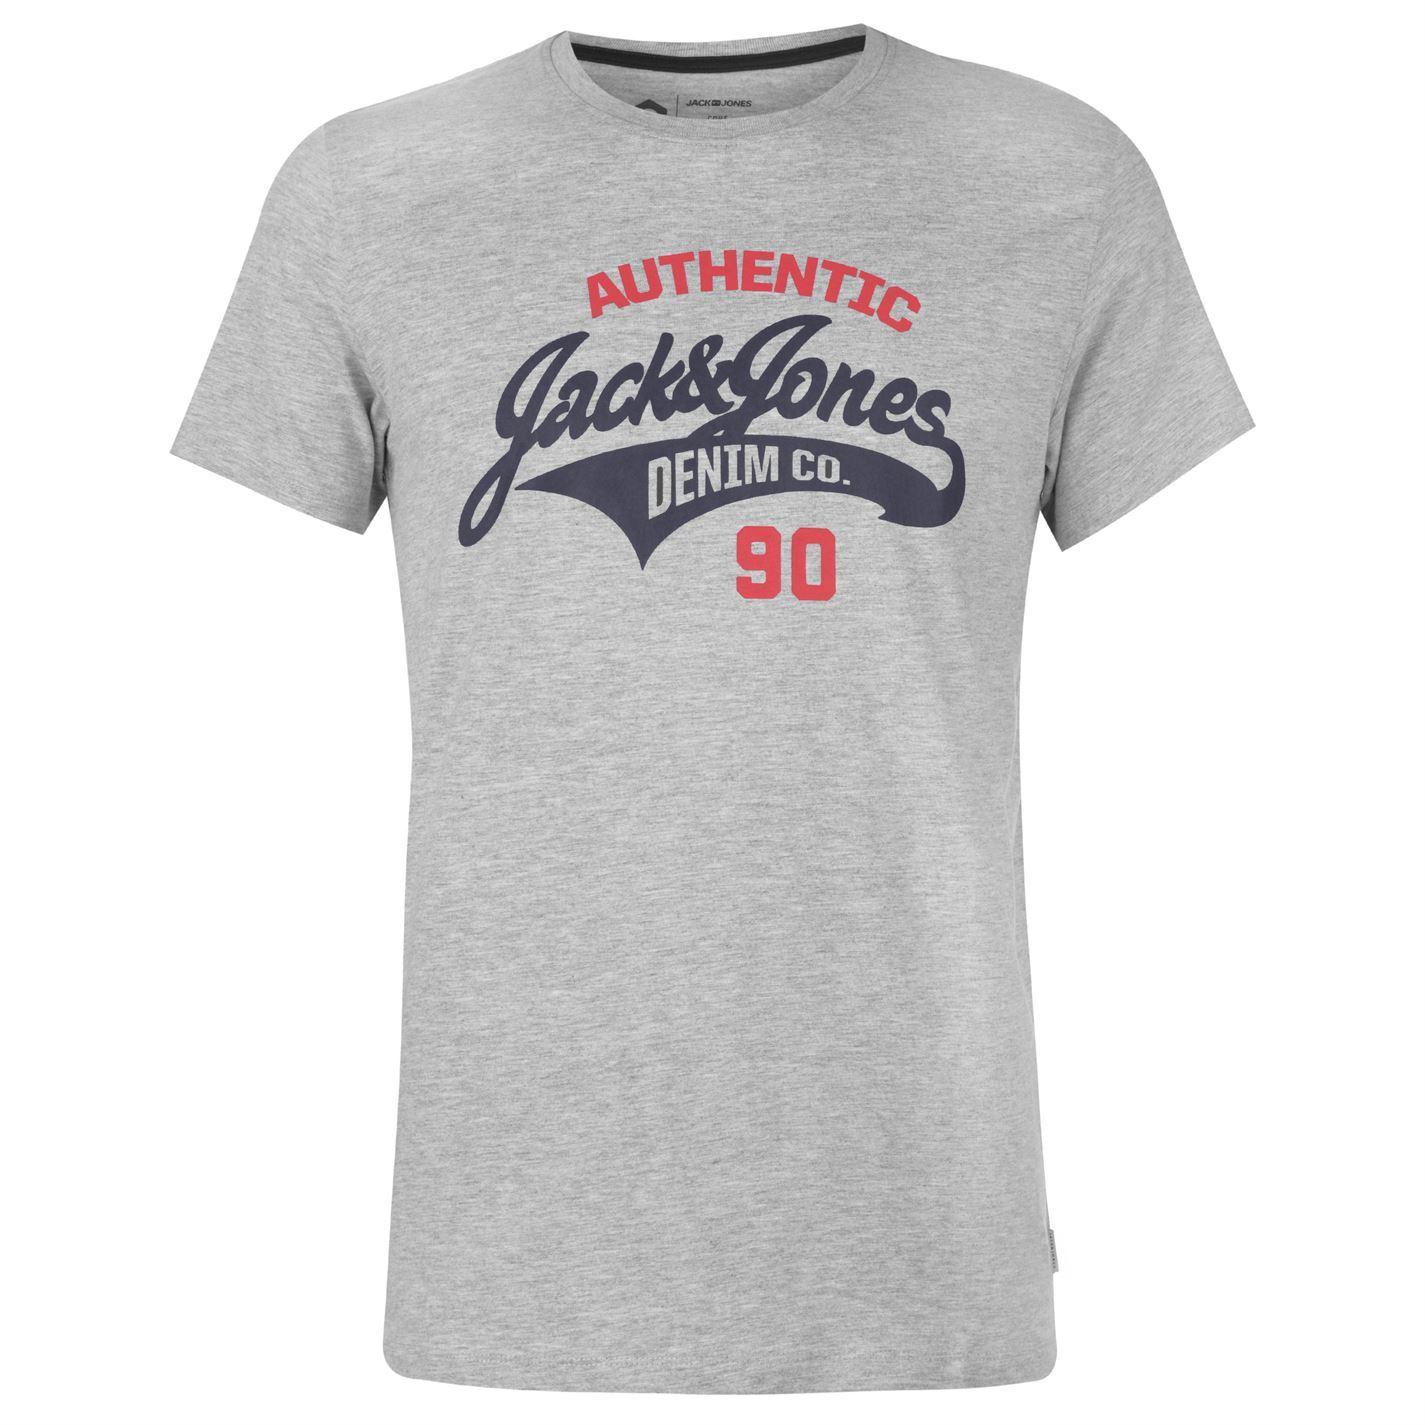 Jack-and-Jones-Core-Heritage-Logo-T-Shirt-Mens-Tee-Shirt-Top thumbnail 3